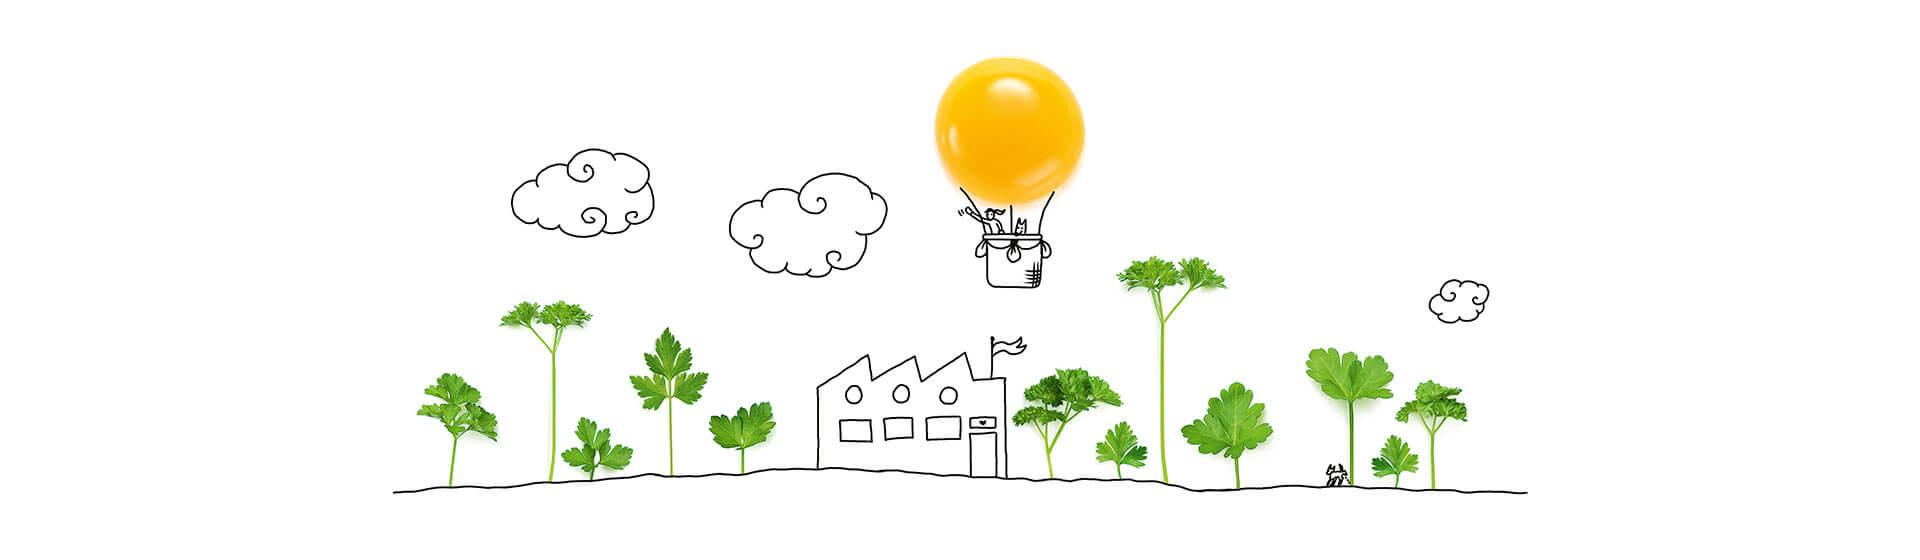 Ballon aus Eigelb